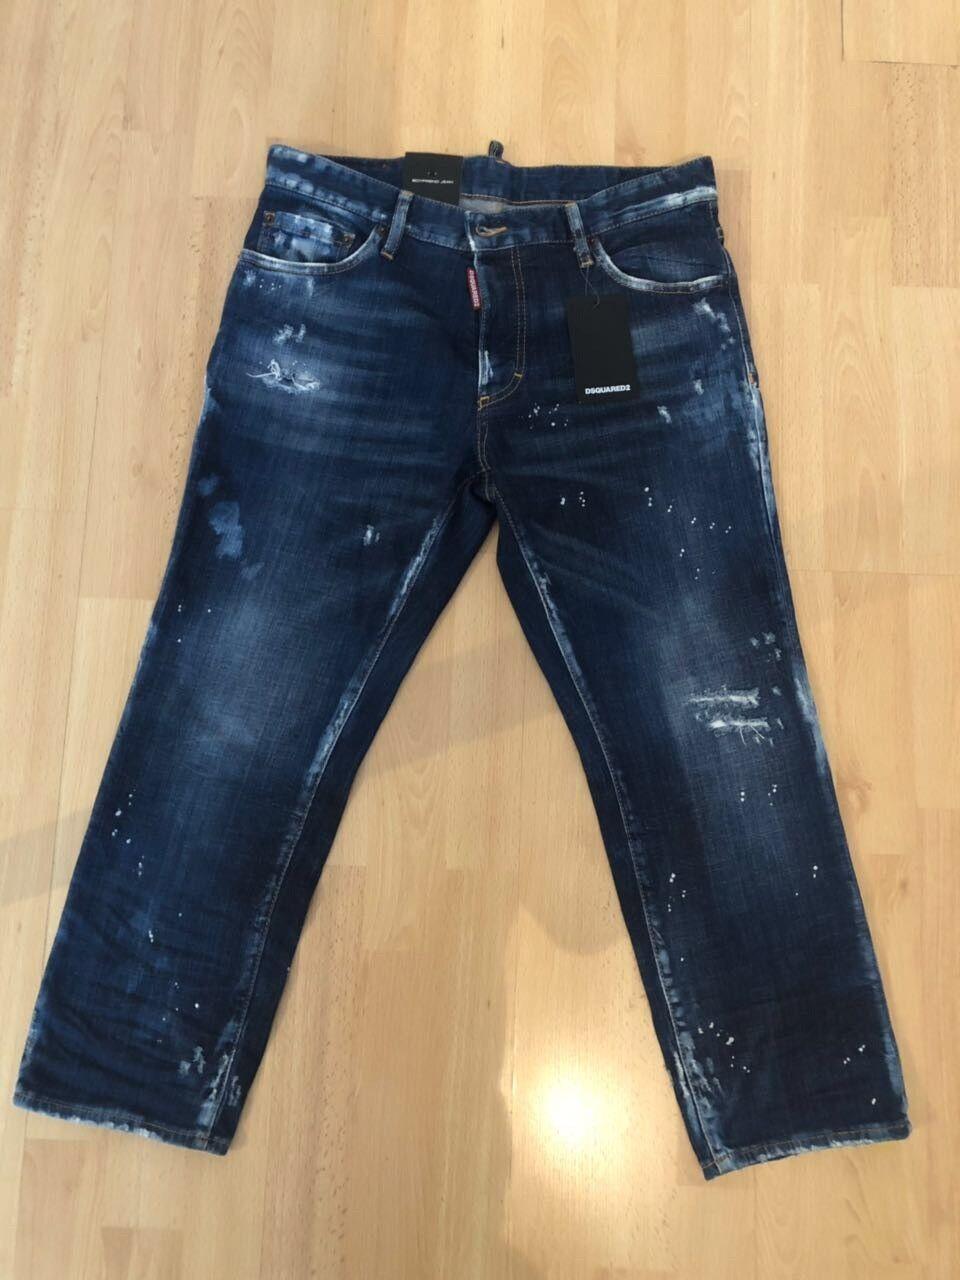 Boyfriend-Jeans DSQUArot2 NEU & ORIGINAL Grösse 36 ( Ita. 42)